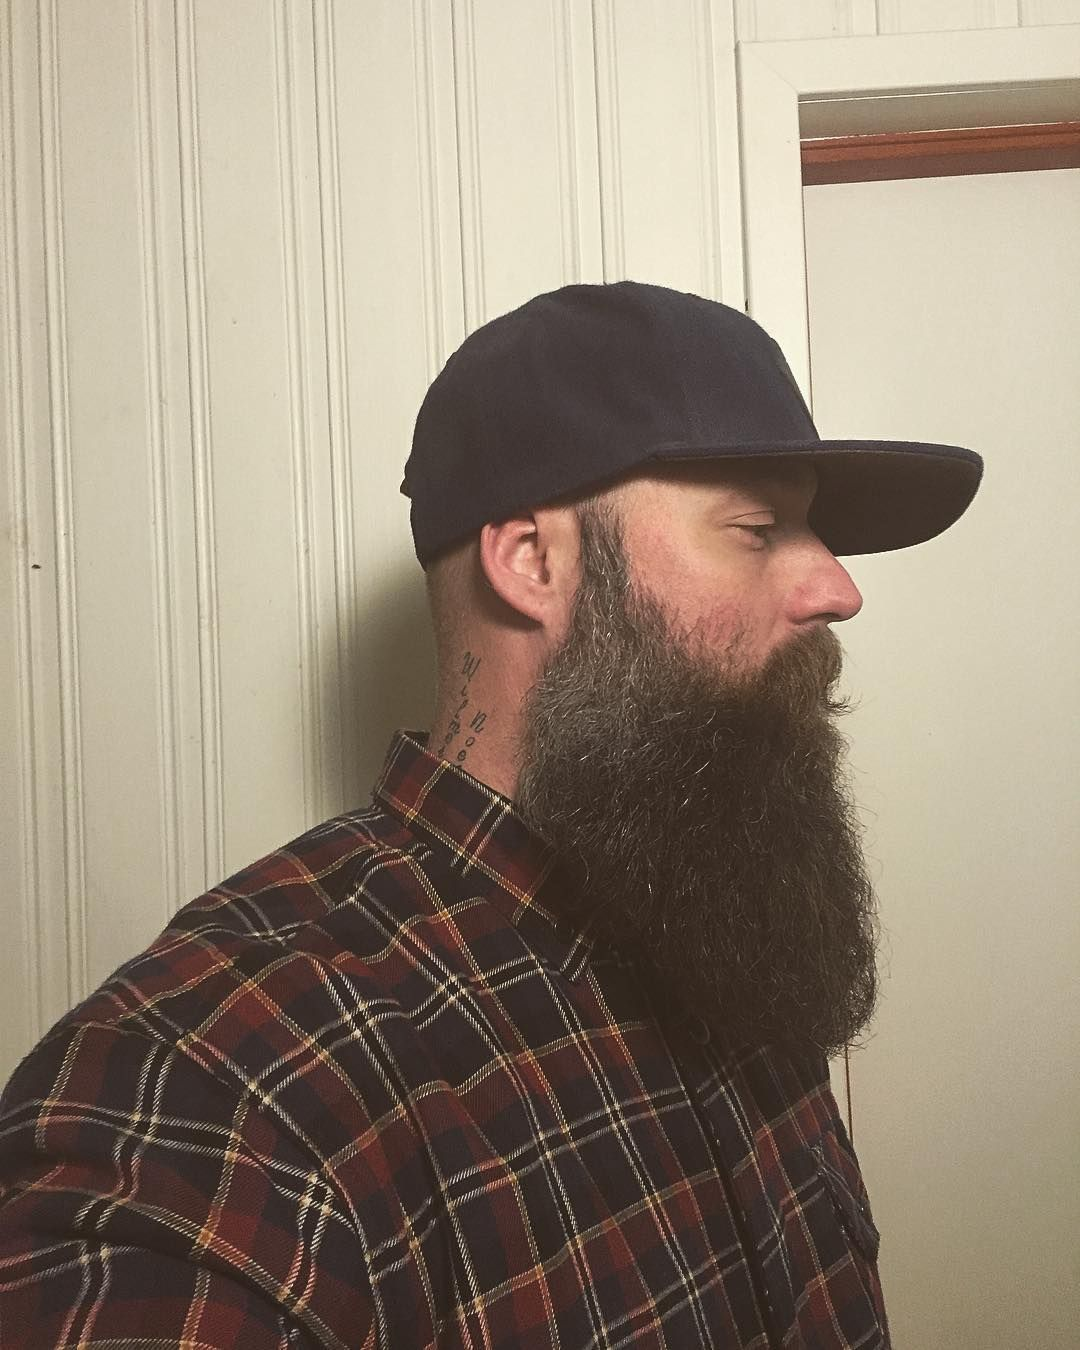 Keep on grinding  . #beard #beardoftheday #beard4all #bearded #staybearded #beardedman #saltybeard #topoftheline #beardo #skäggig #skjegg #beardsarebeautiful #truegentlemen #beards #mybeardisnotatrend #beardedmanappereal #skjeggig #getbearded #selfie #instafollow #skägg #tattos #theinfamouswestcoastbarbershop #labarba #beardthefuckup #instabeard #me